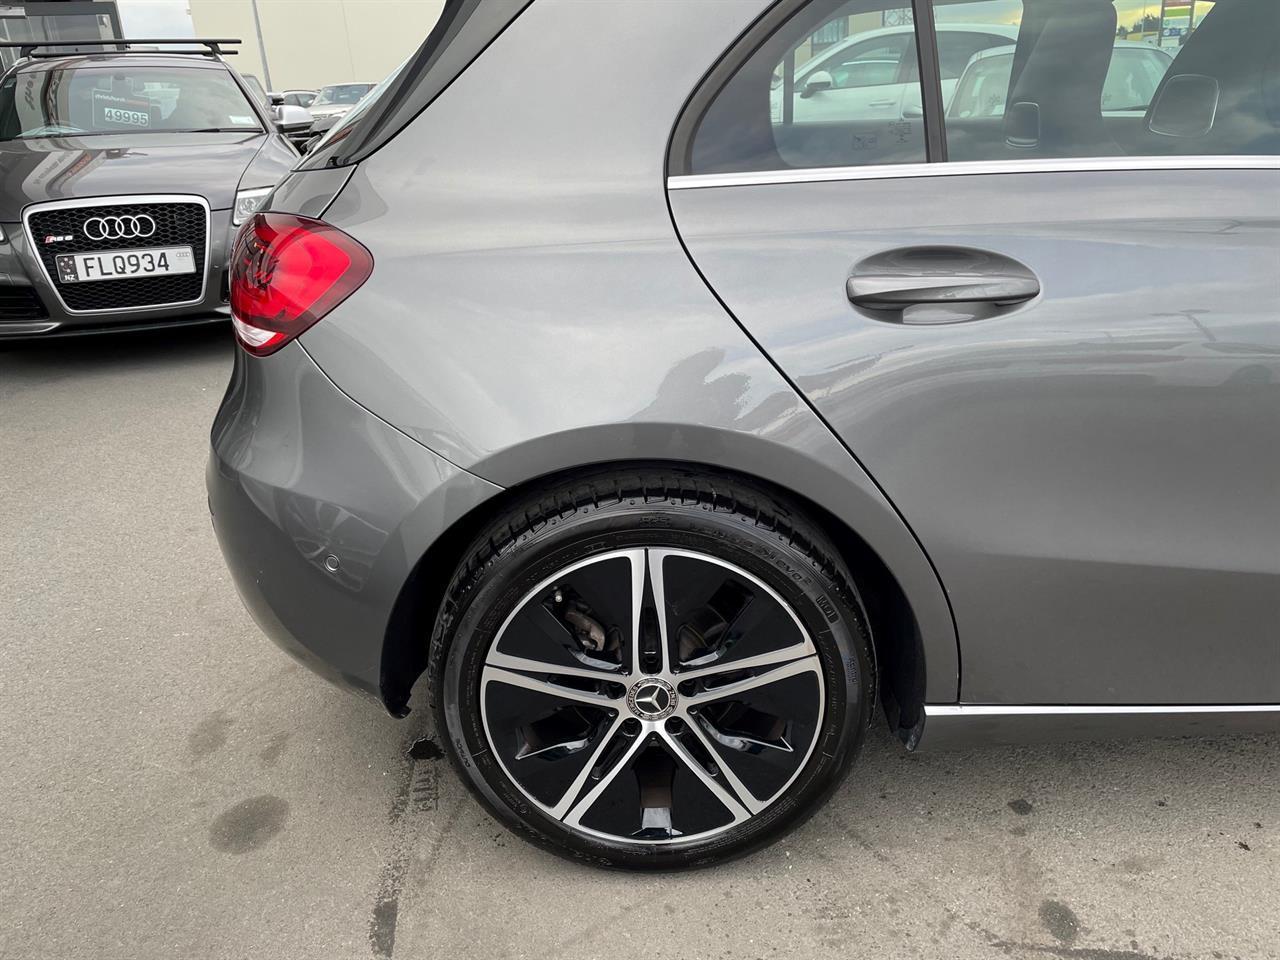 image-8, 2019 MercedesBenz A180 1.3T 7 Speed New Model at Christchurch